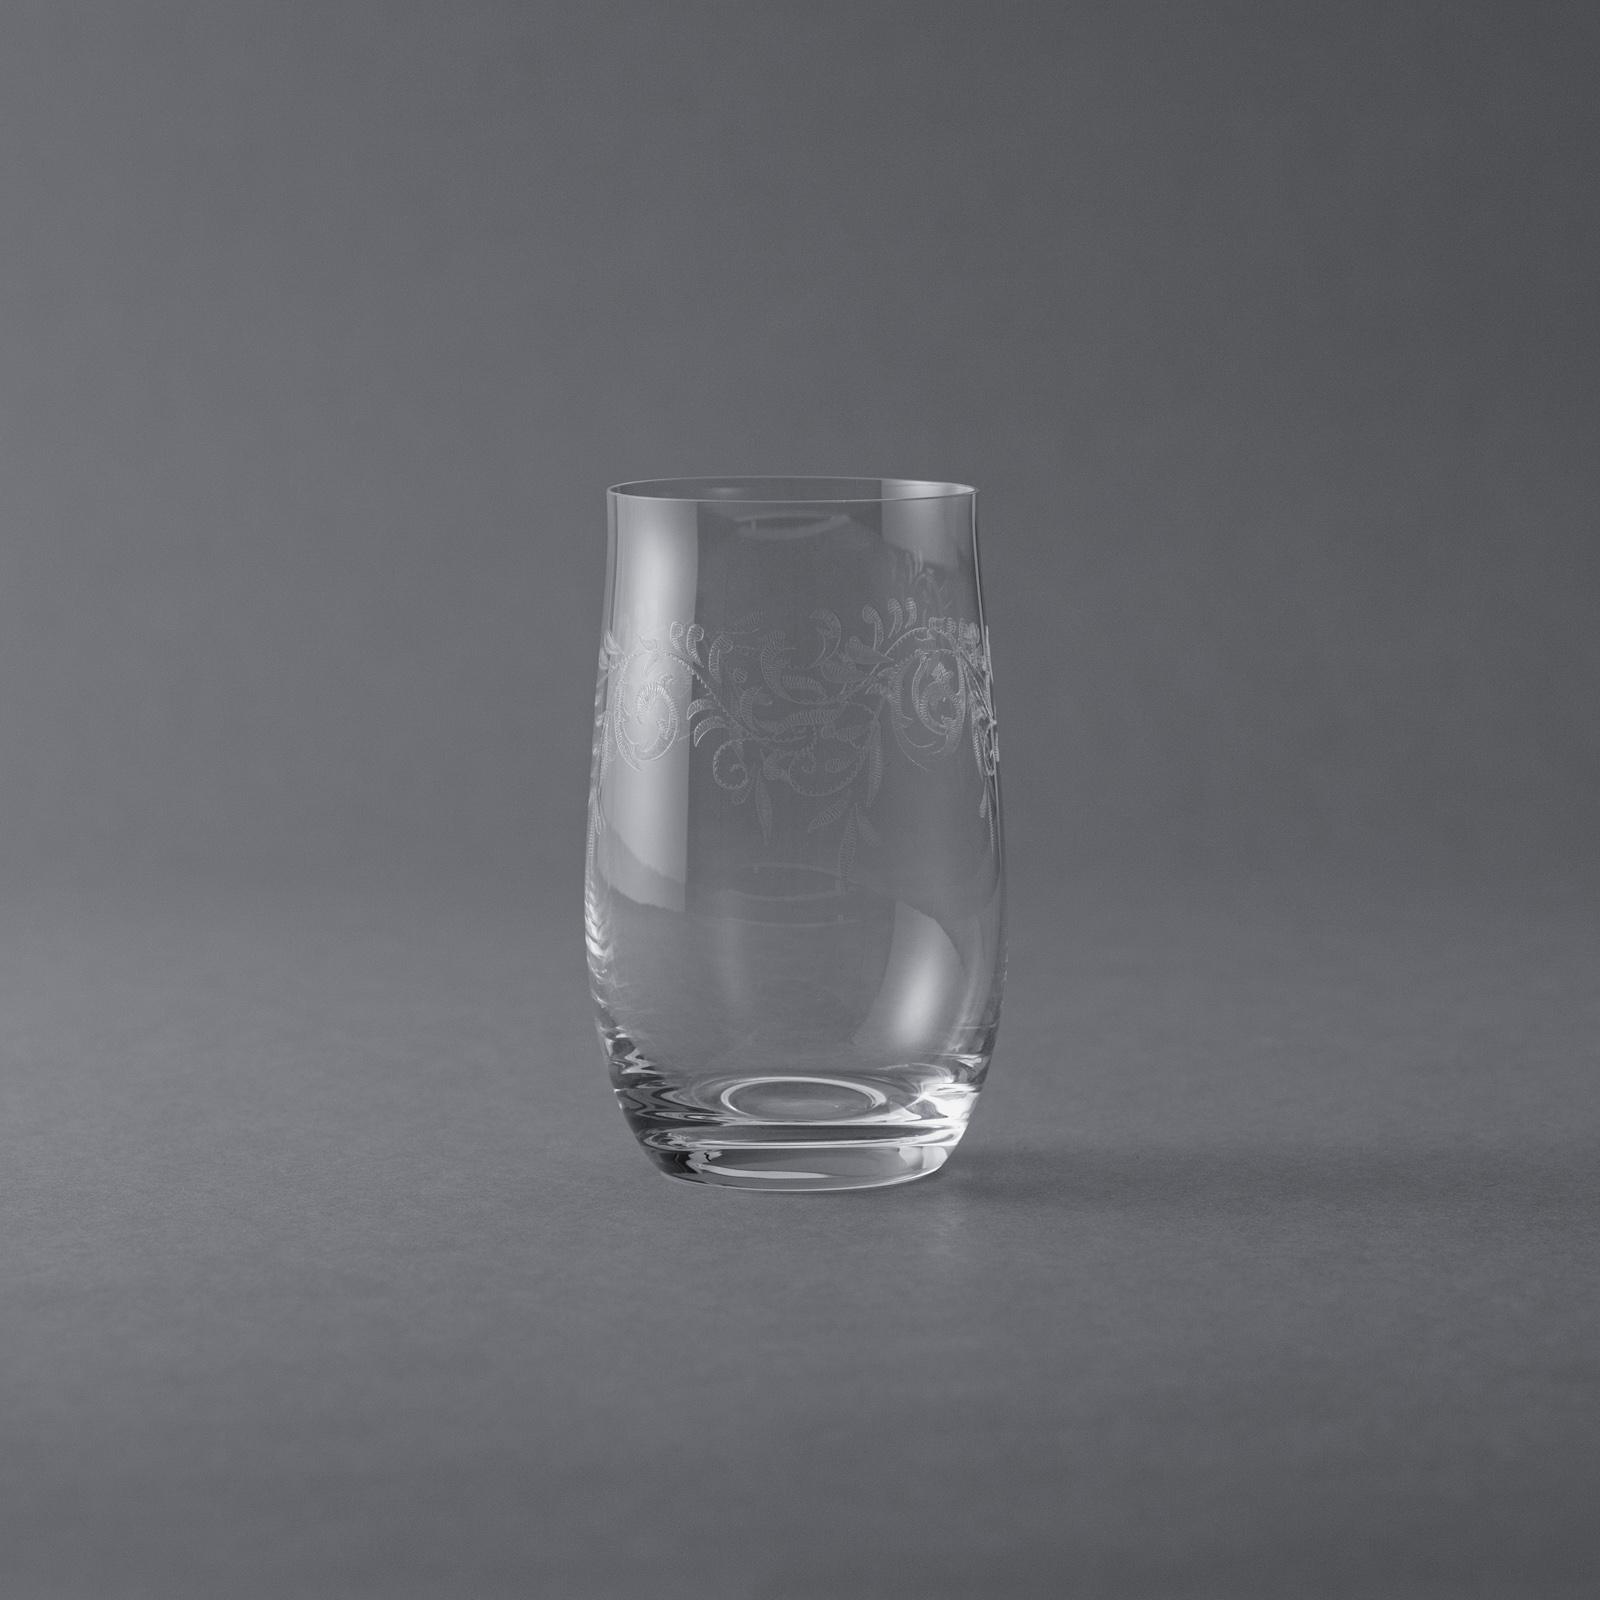 BOHEMIA Cristal _ ロマンス / タンブラー